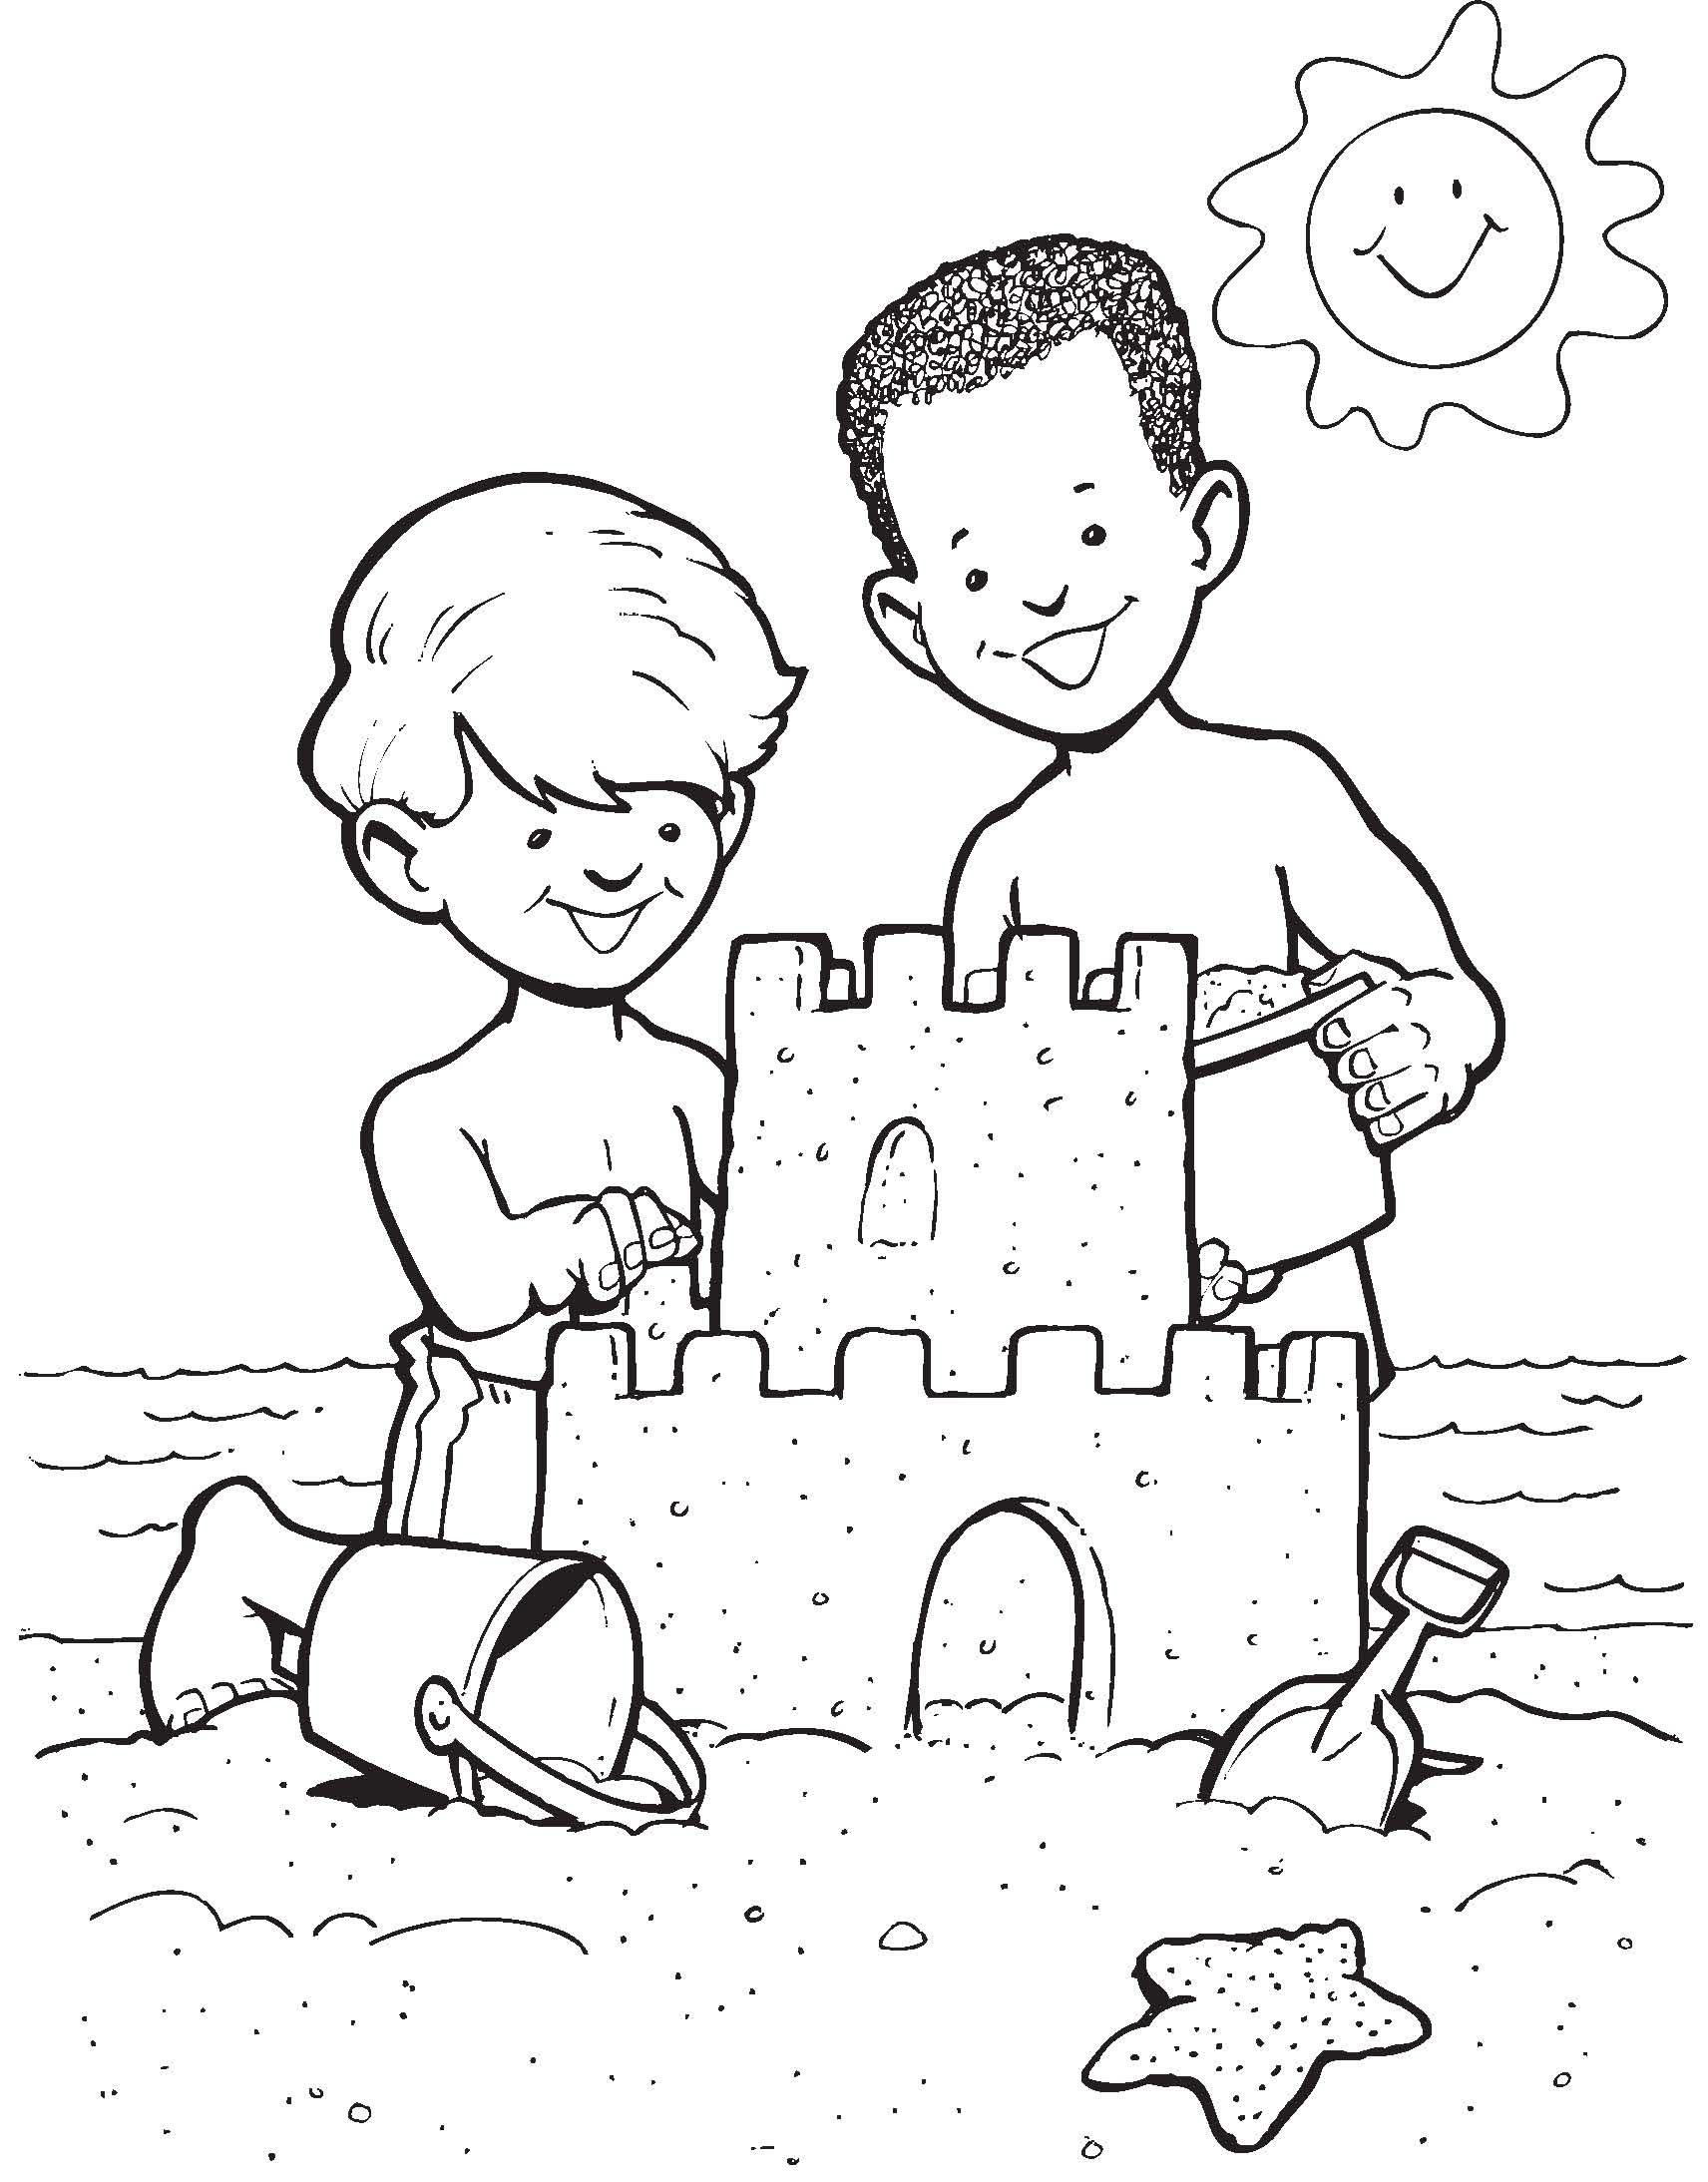 Sandcastle Fun Castle Coloring Page Summer Coloring Pages Free Disney Coloring Pages